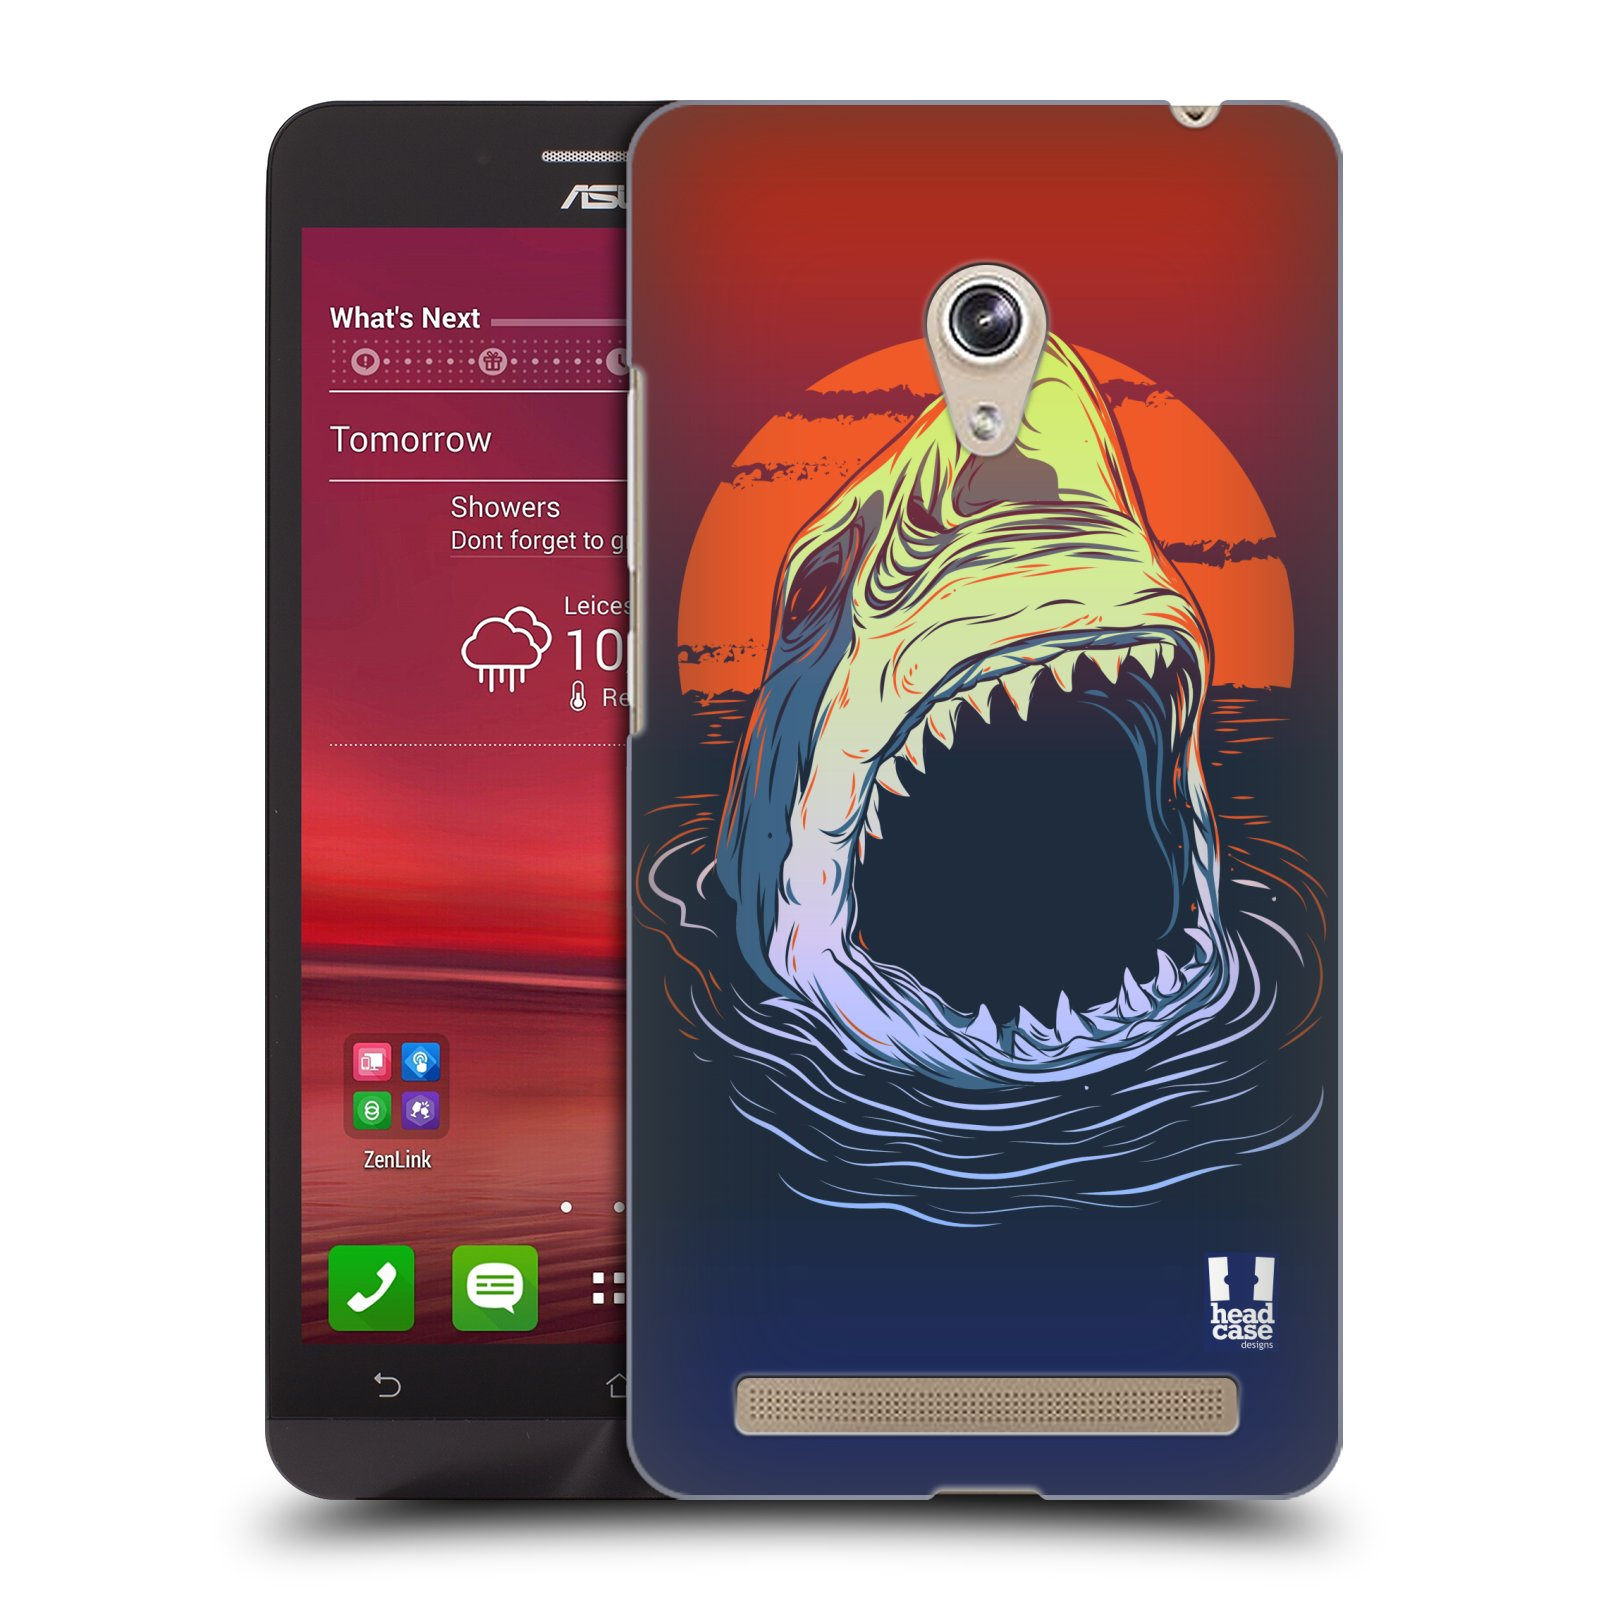 HEAD CASE plastový obal na mobil Asus Zenfone 6 vzor mořská monstra žralok